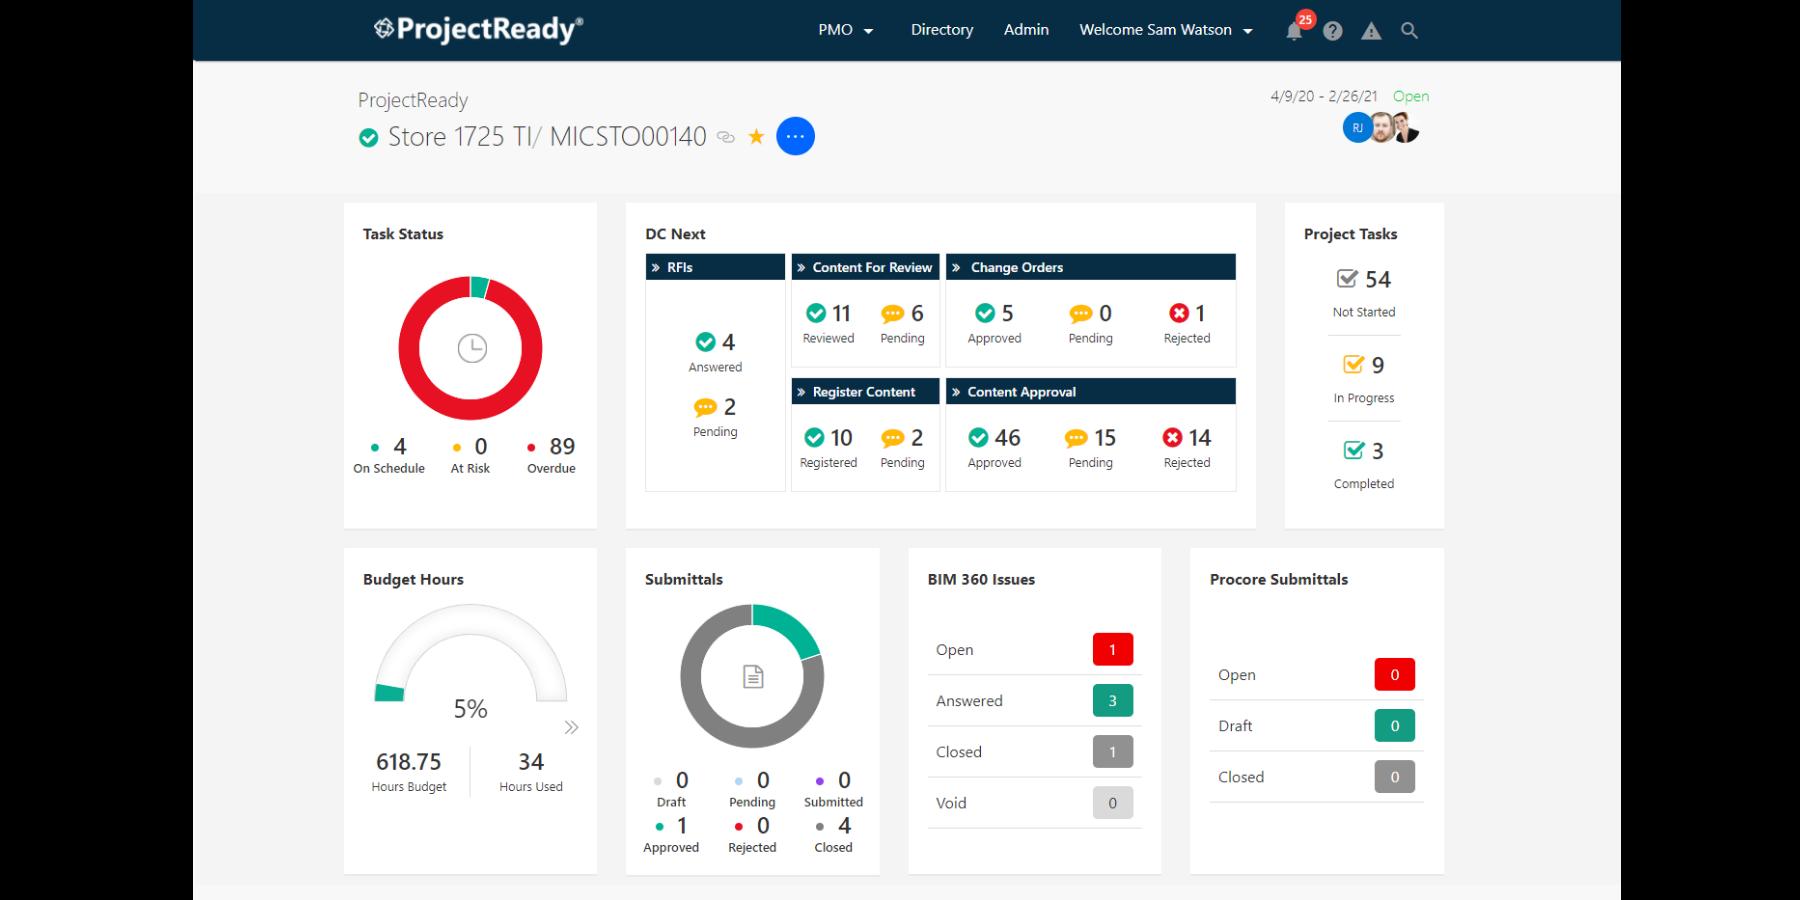 ProjectReady dashboard